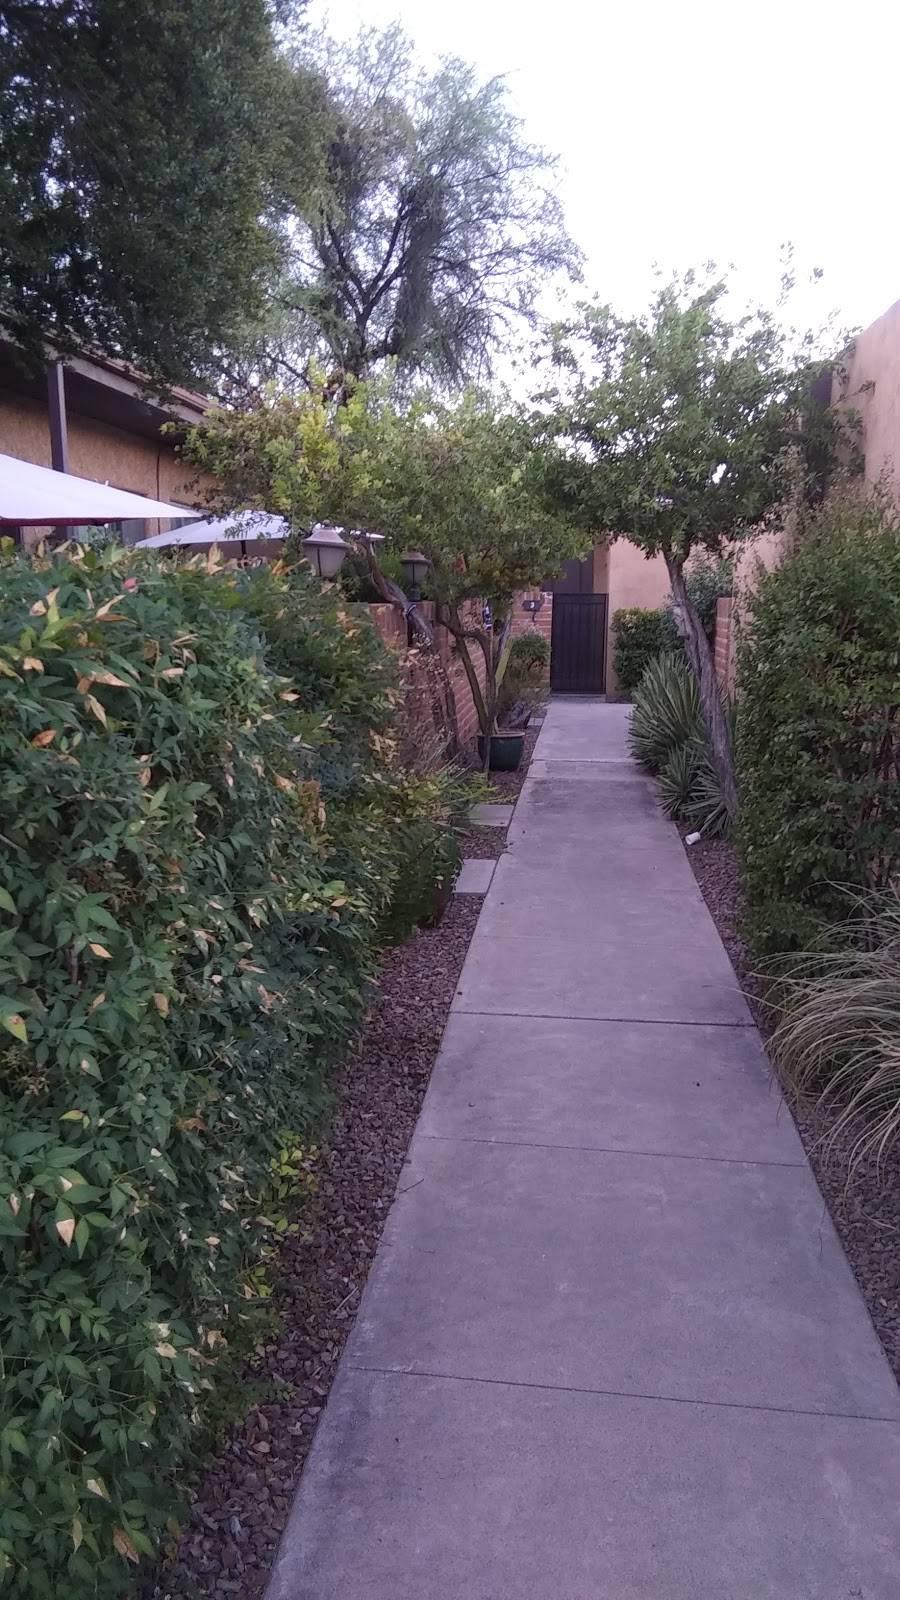 Riverside Suites - real estate agency    Photo 10 of 10   Address: 1725 E Limberlost Dr, Tucson, AZ 85719, USA   Phone: (520) 202-2210